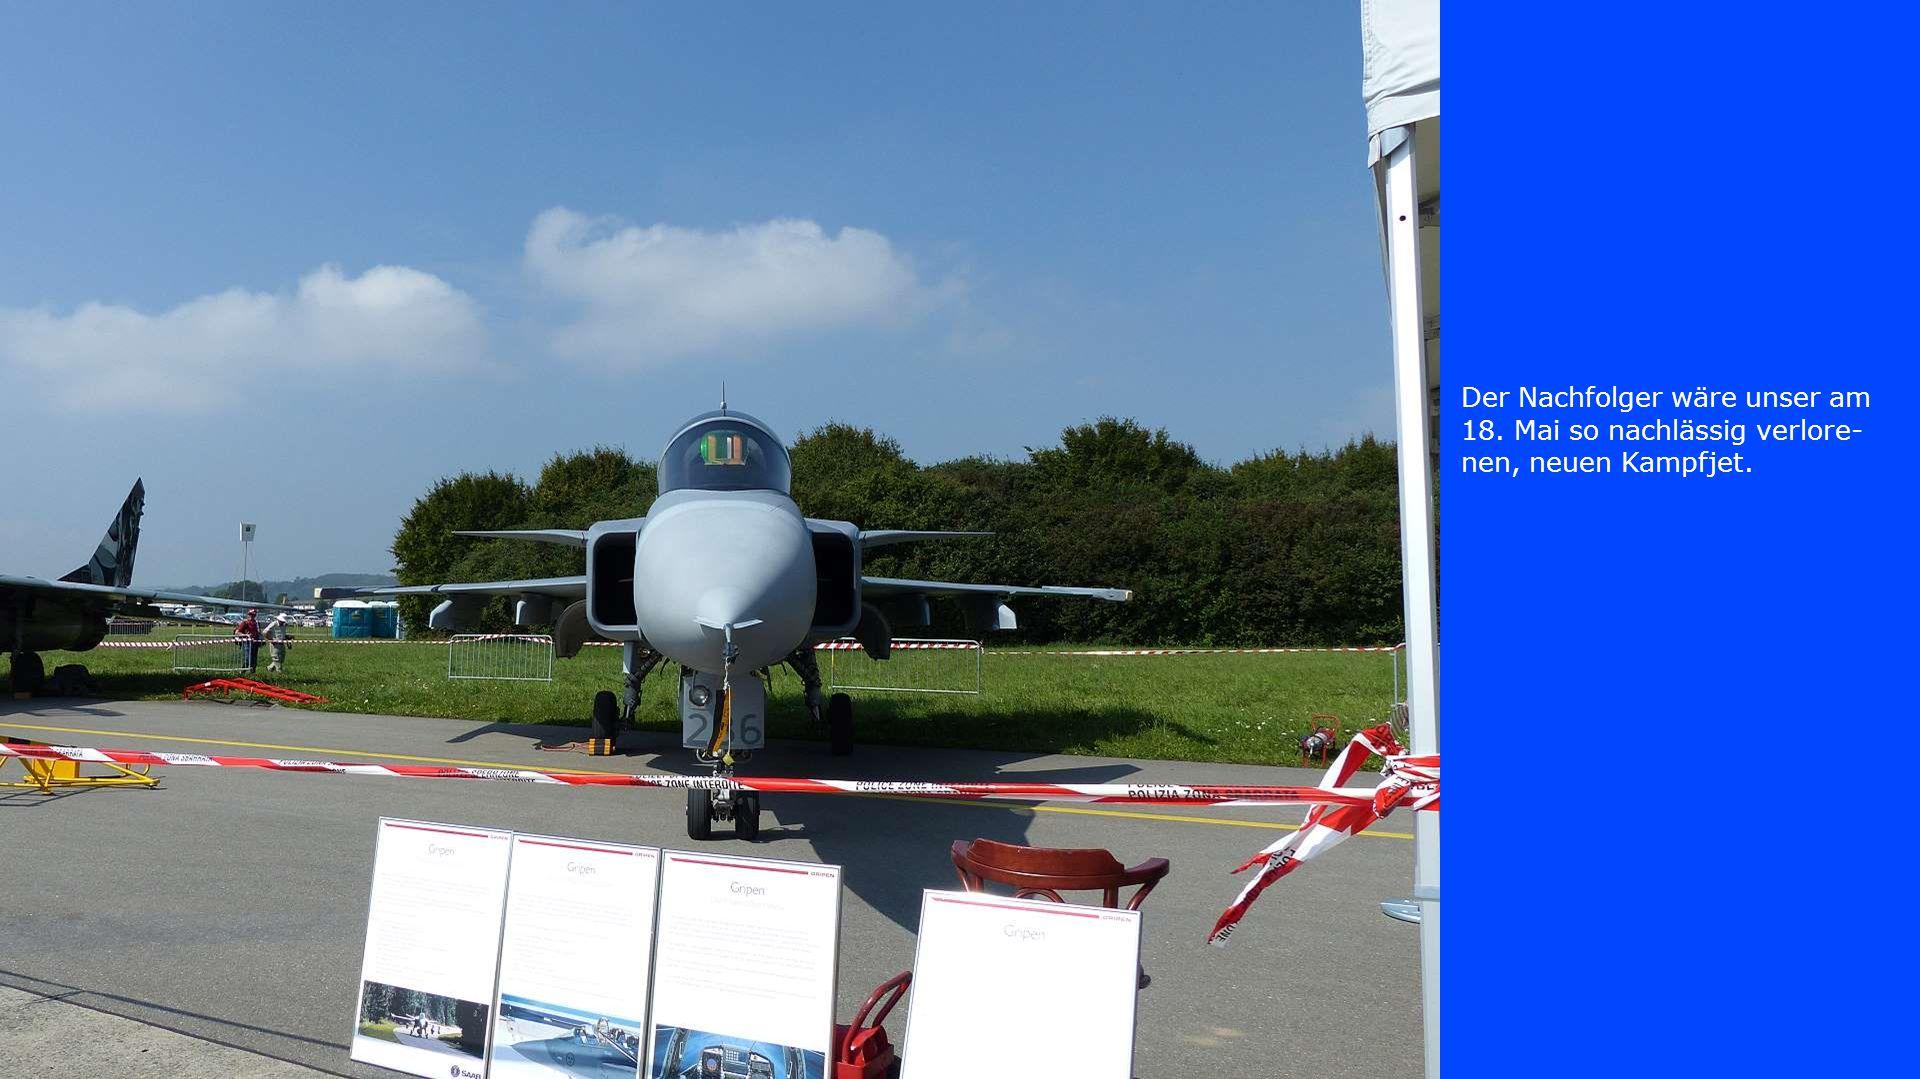 Der Nachfolger wäre unser am 18. Mai so nachlässig verlore- nen, neuen Kampfjet.